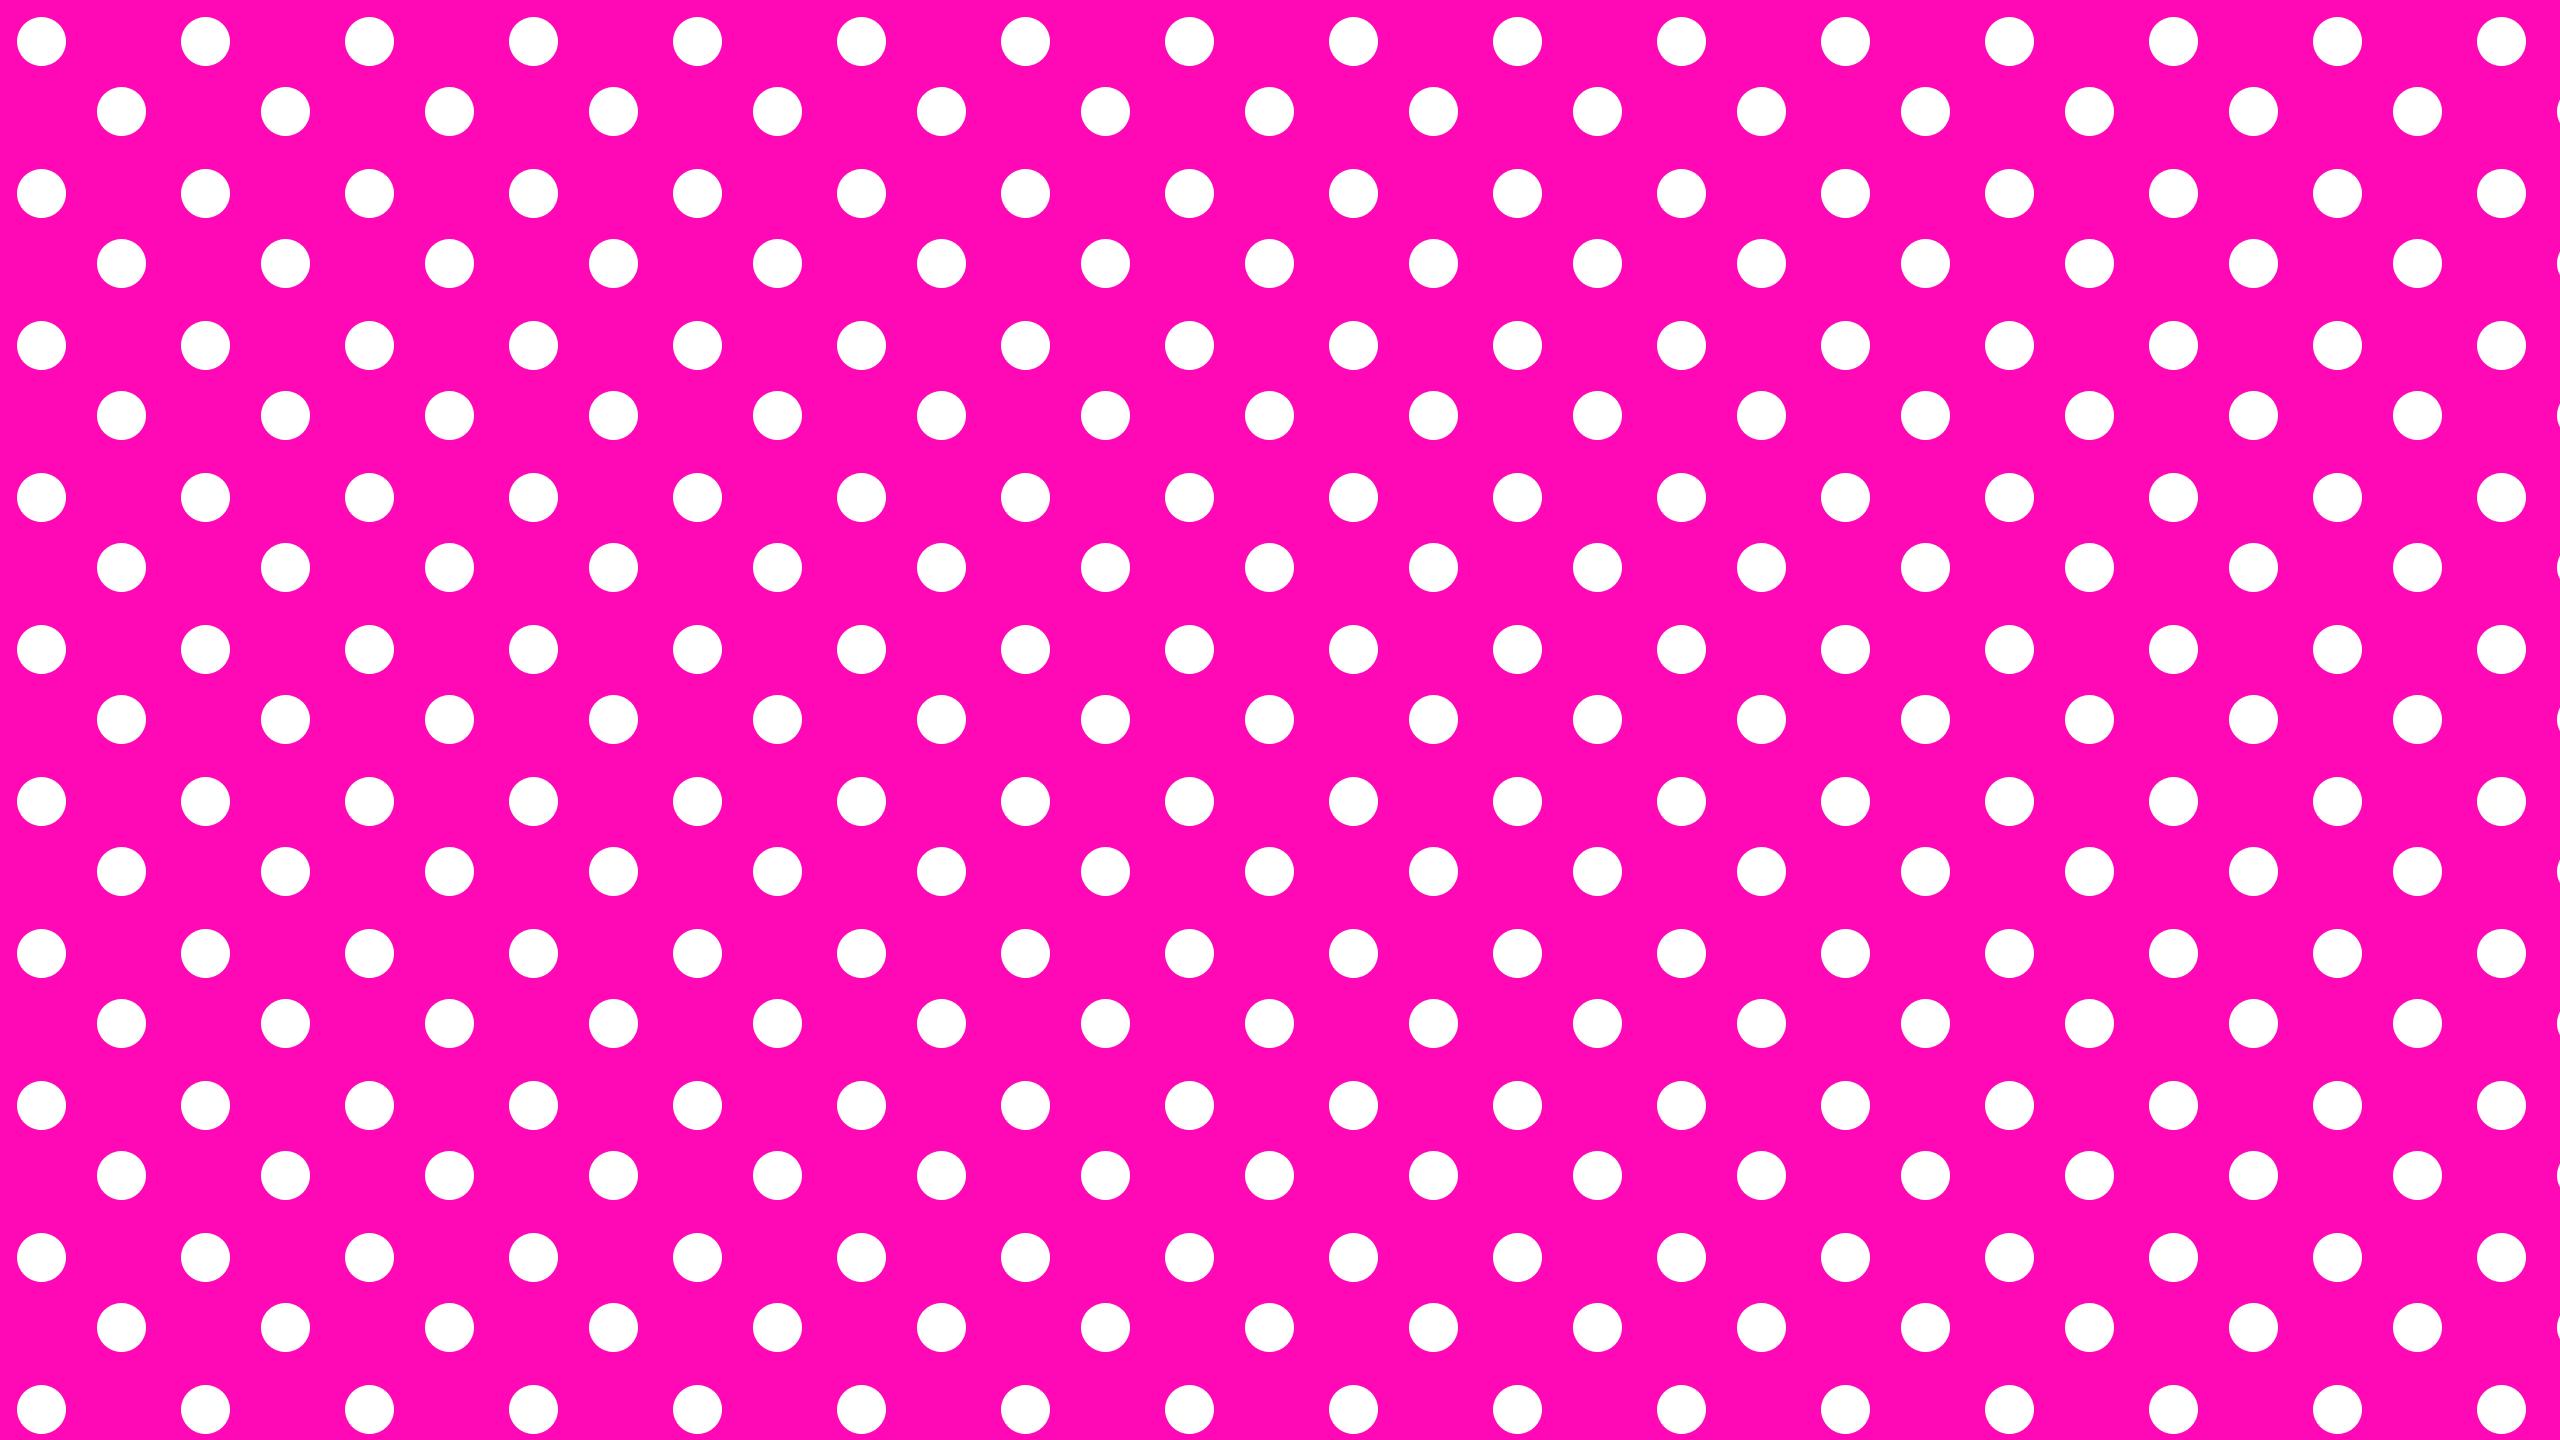 Pink desktop large wallpaper wallpapers 2560x1440